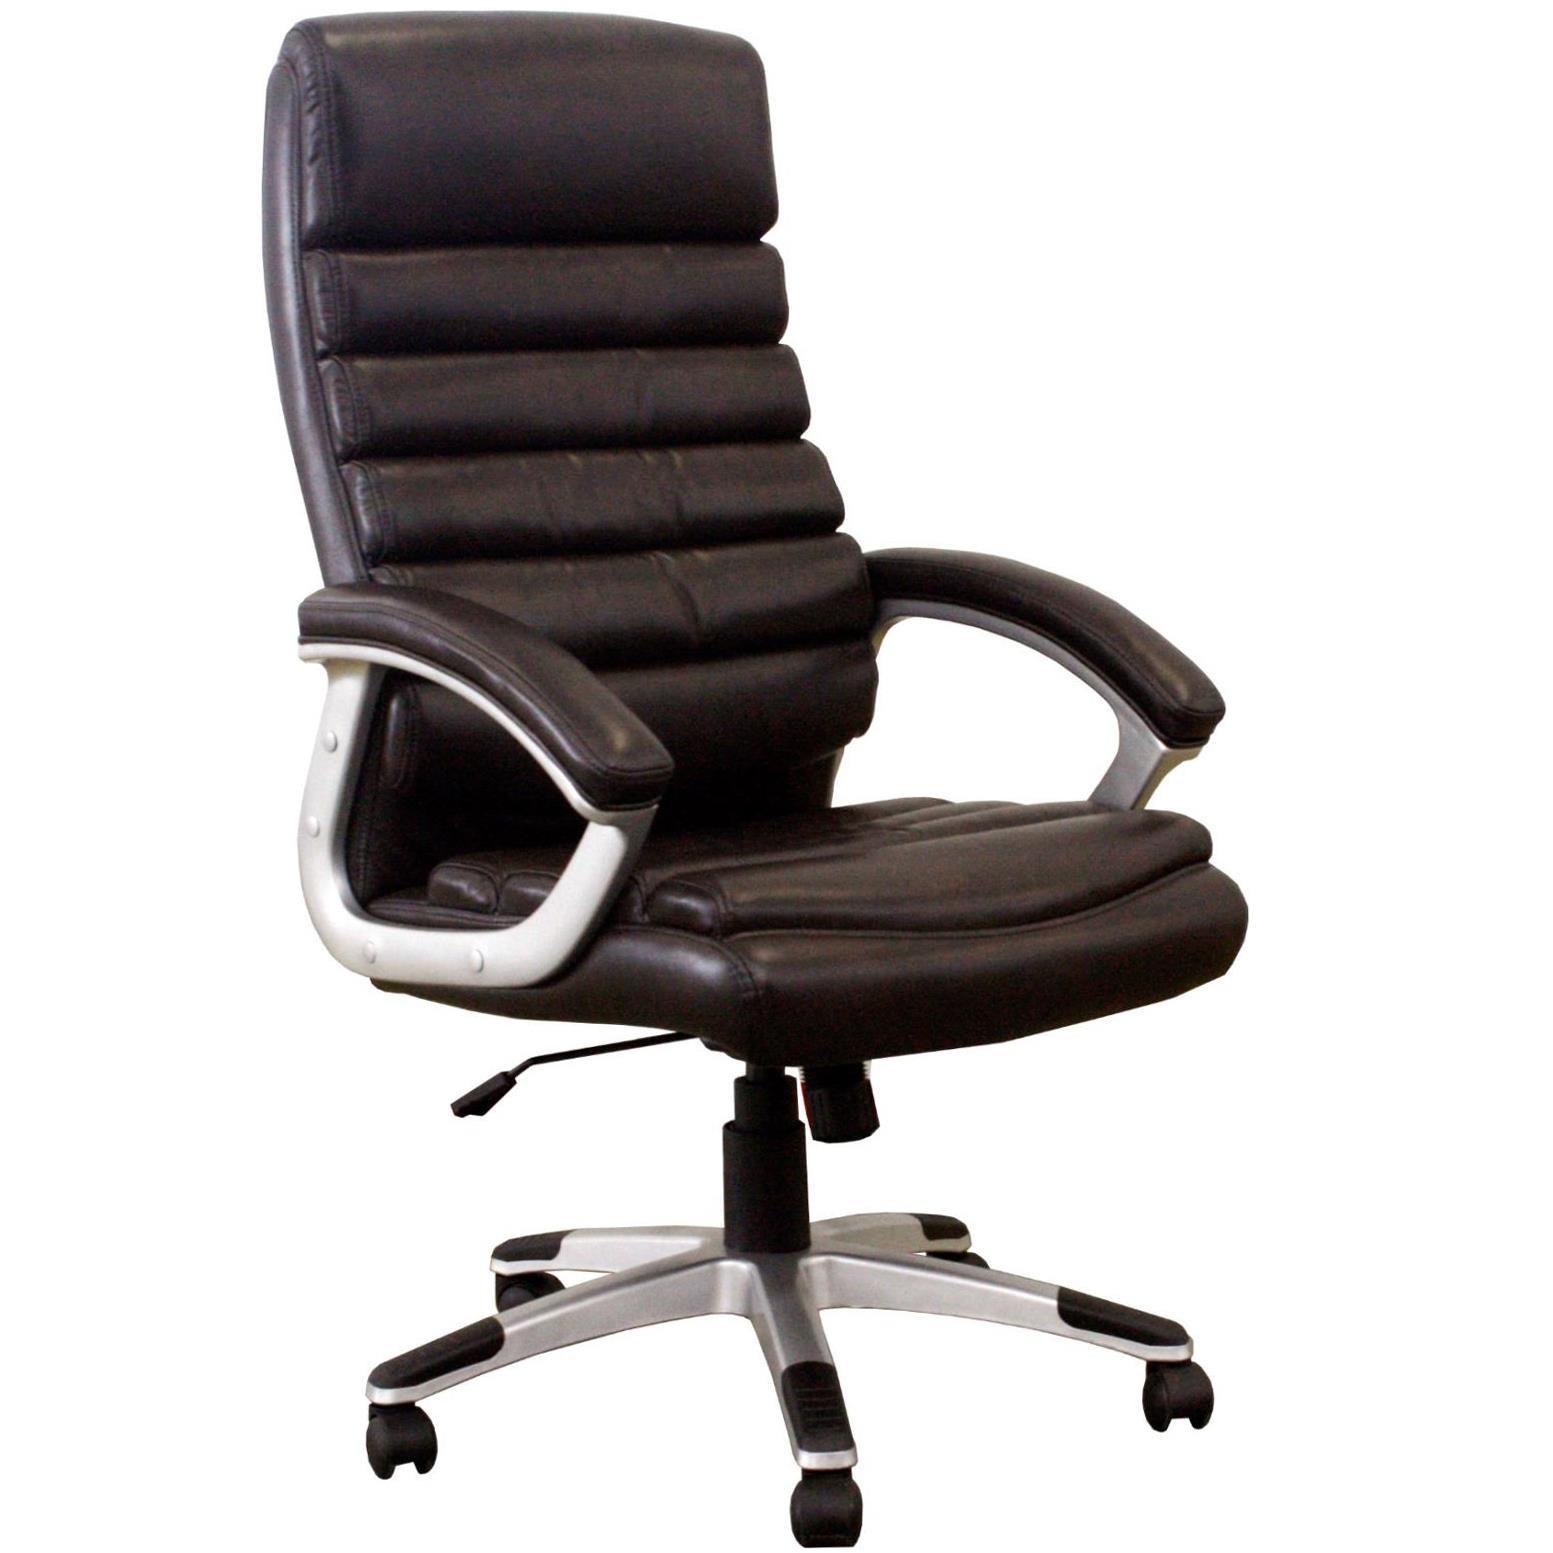 Parker Living Desk Chairs Desk Chair - Item Number: DC-200-JA